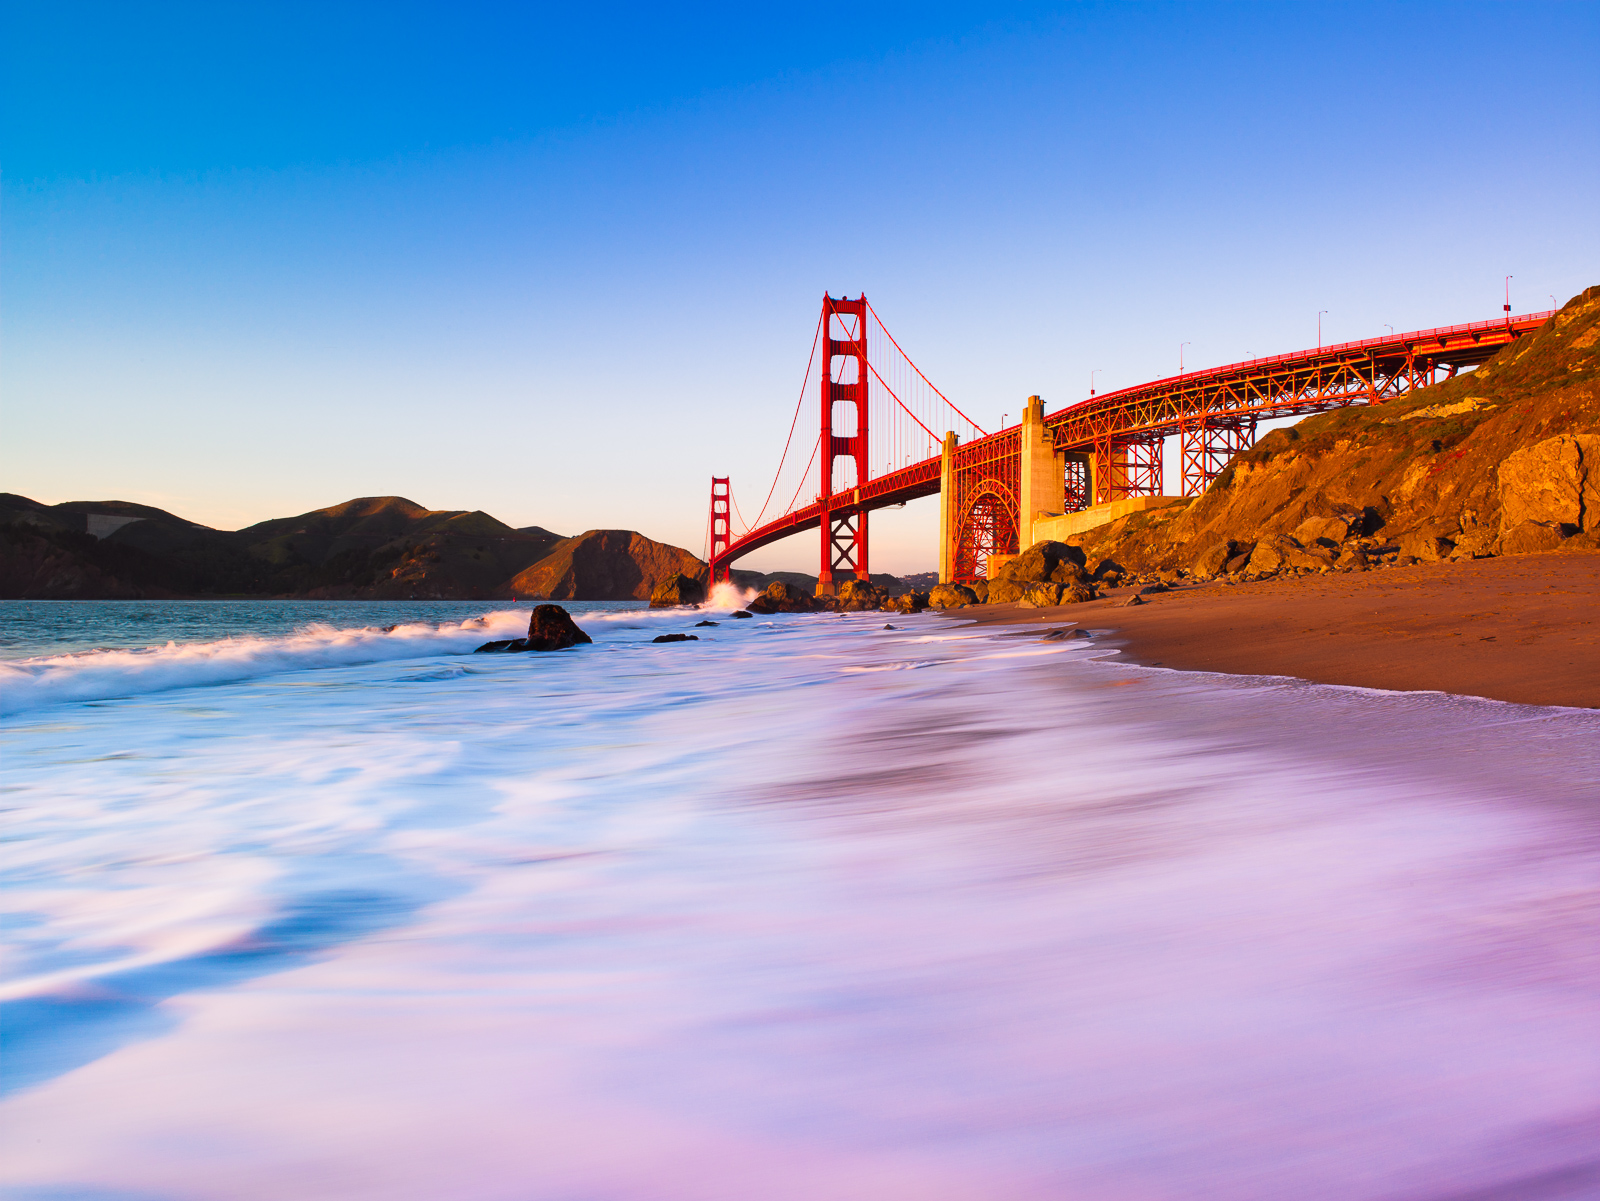 Gateway to the Pacific, Bridge,California,Golden Gate Bridge,Horizontal,Orange,San Francisco,cityscape,landscape,sunset, photo